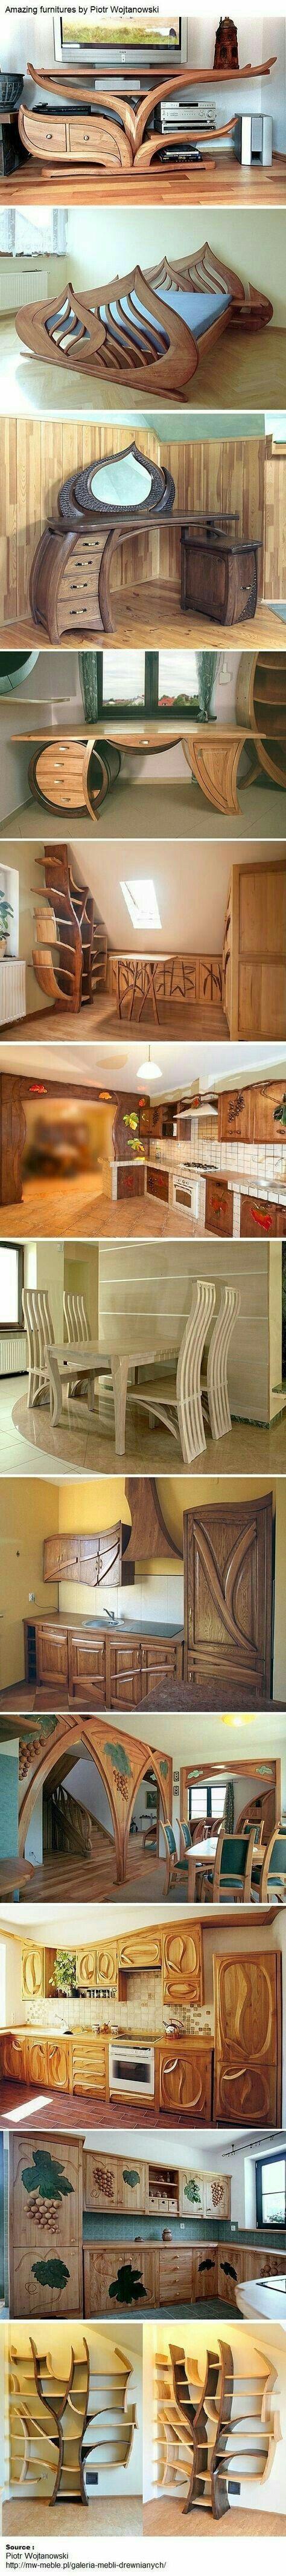 7 Mejores Im Genes De Muebles En Pinterest Carpinter A Ideas De  # Muebles Cavacitos Monterrey